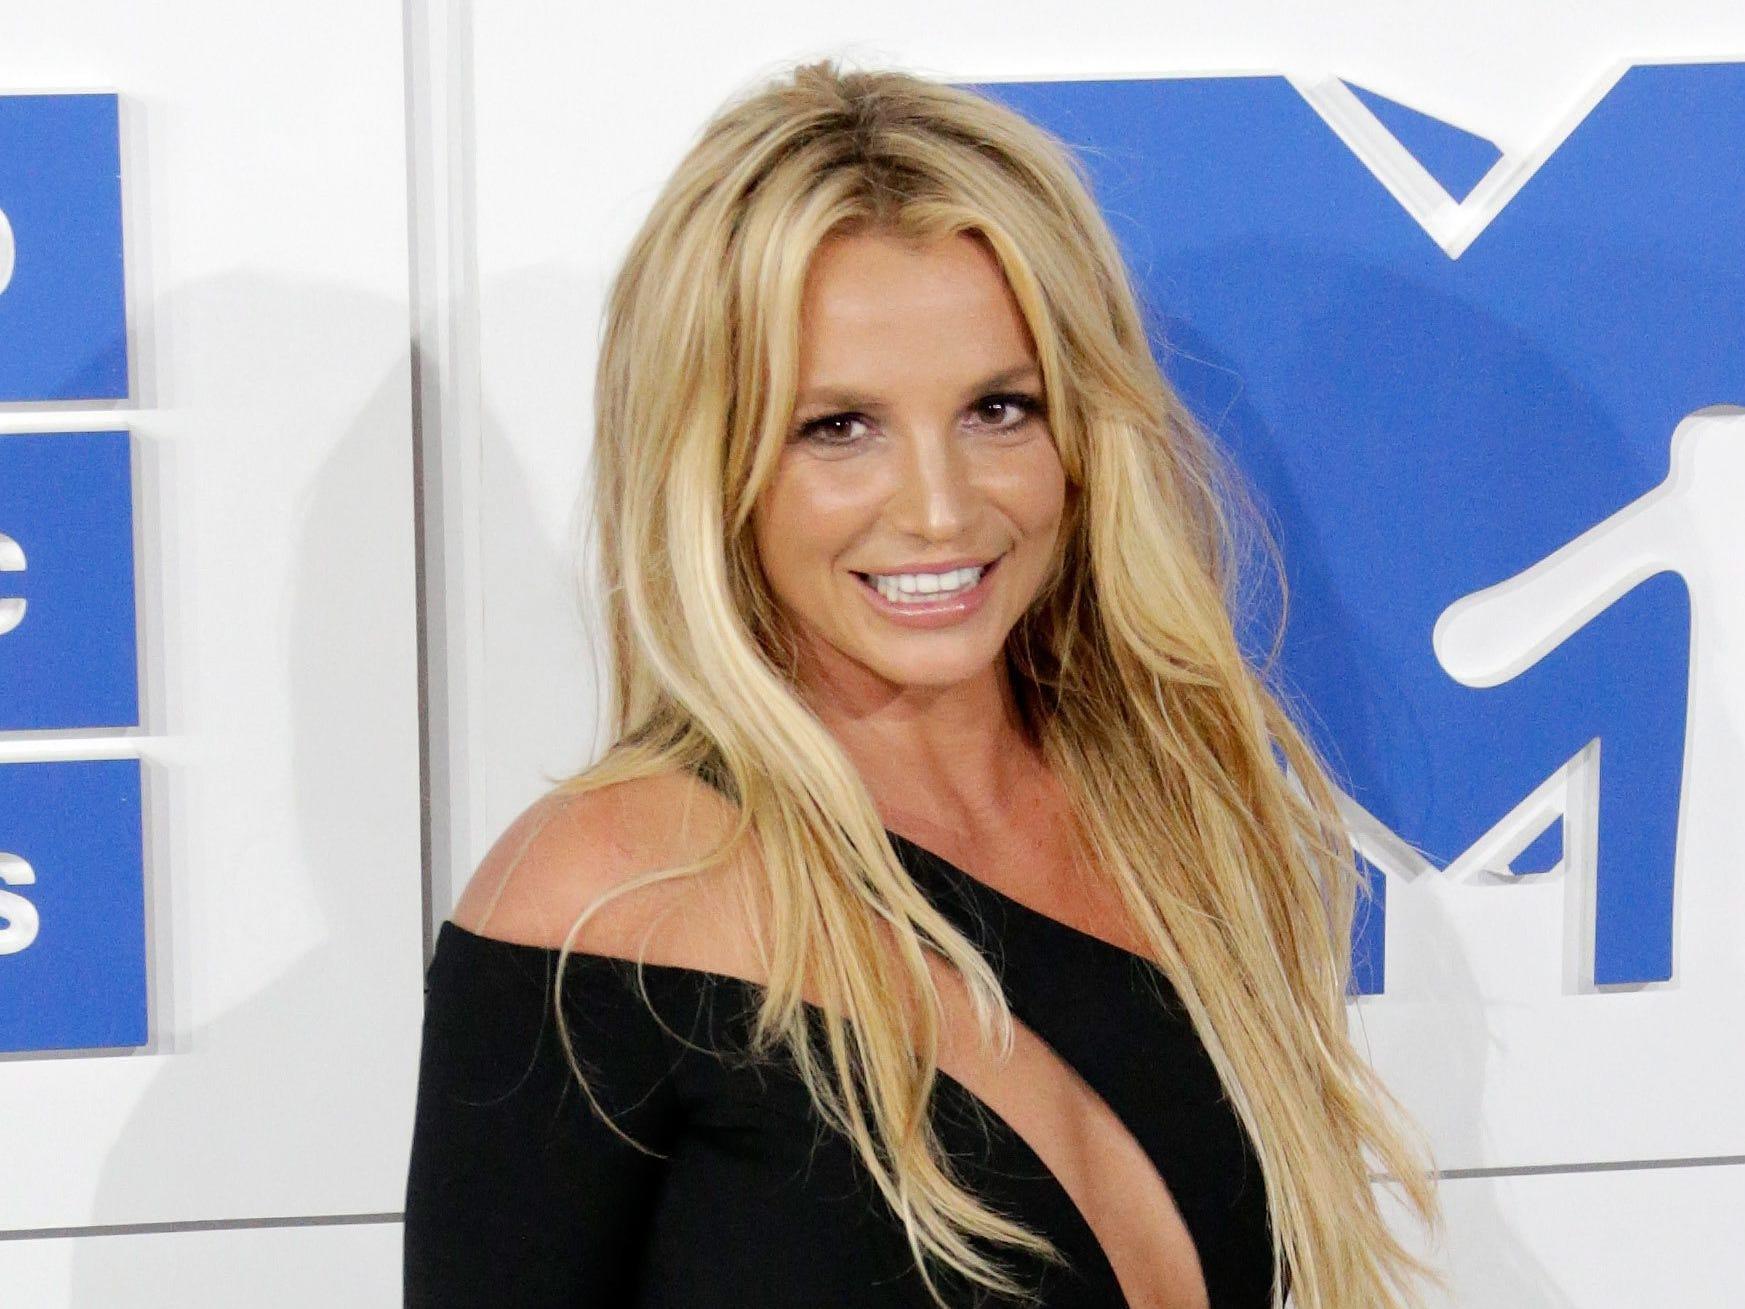 epa05513659 US singer Britney Spears arrives on the red carpet for the 33rd MTV Video Music Awards (VMA) at Madison Square Garden in New York, New York, USA, 28 August 2016.  EPA/JASON SZENES ORG XMIT: JLX74